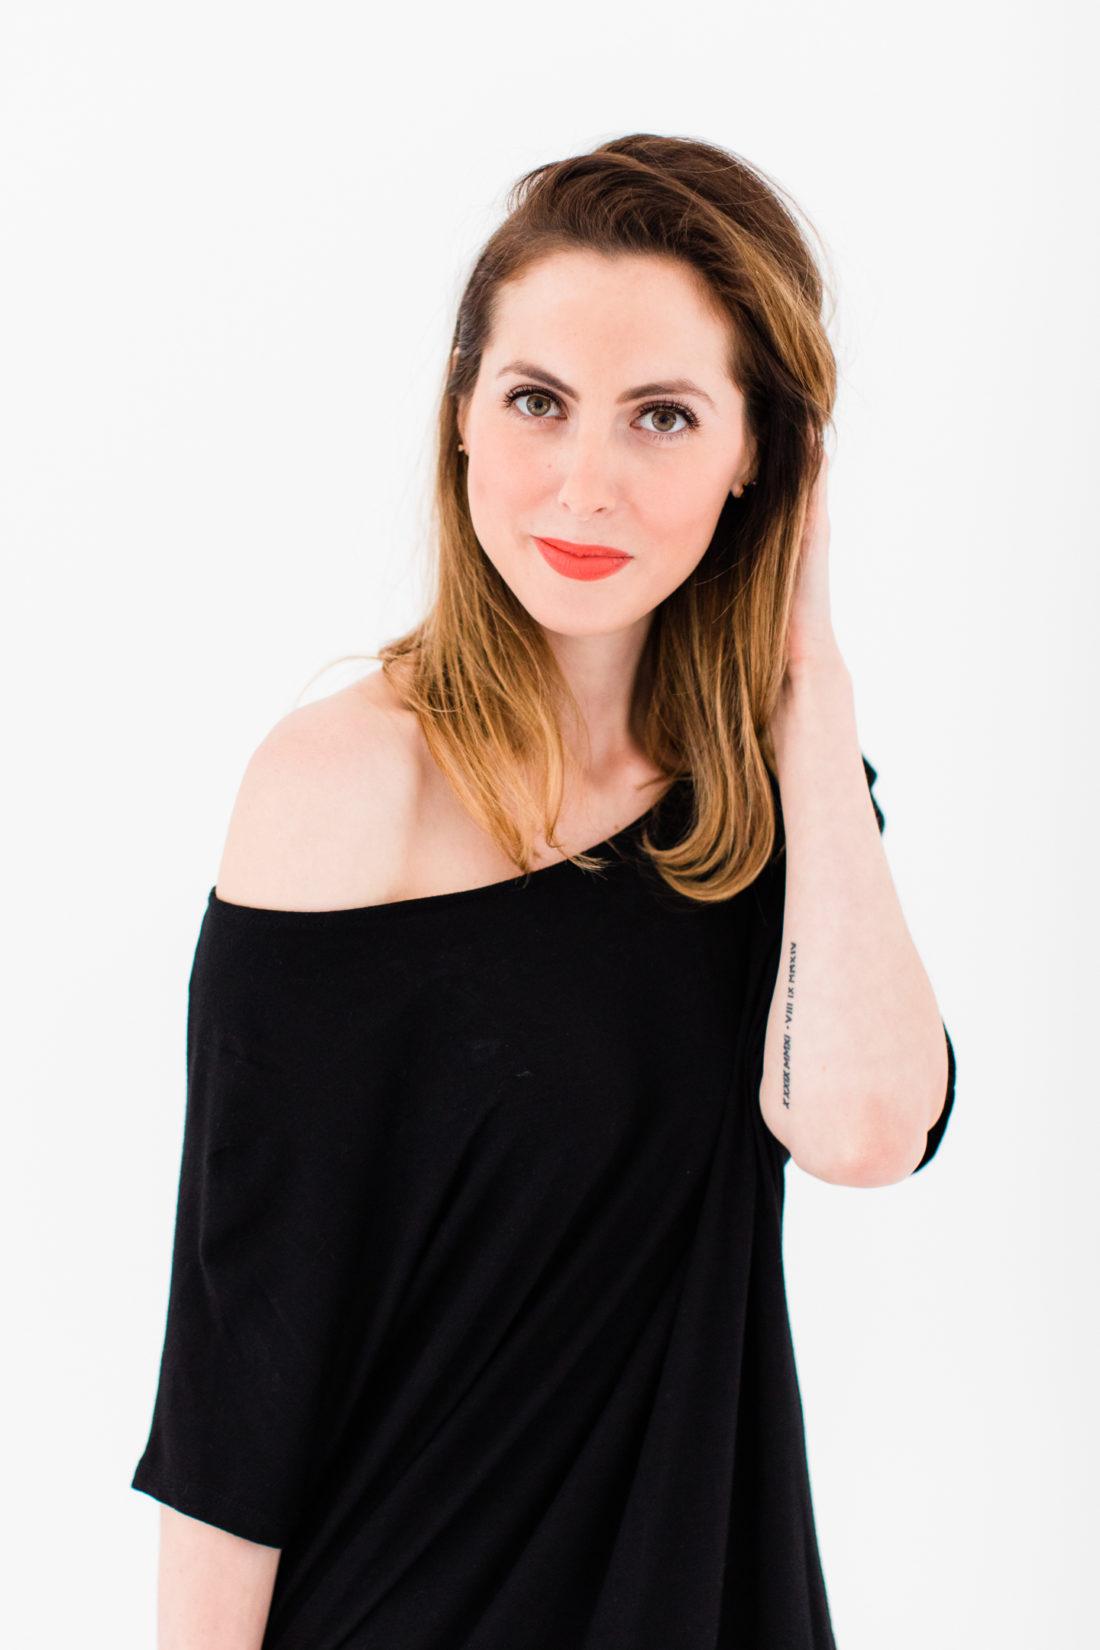 Eva Amurri Martino wears an LBD Buru dress